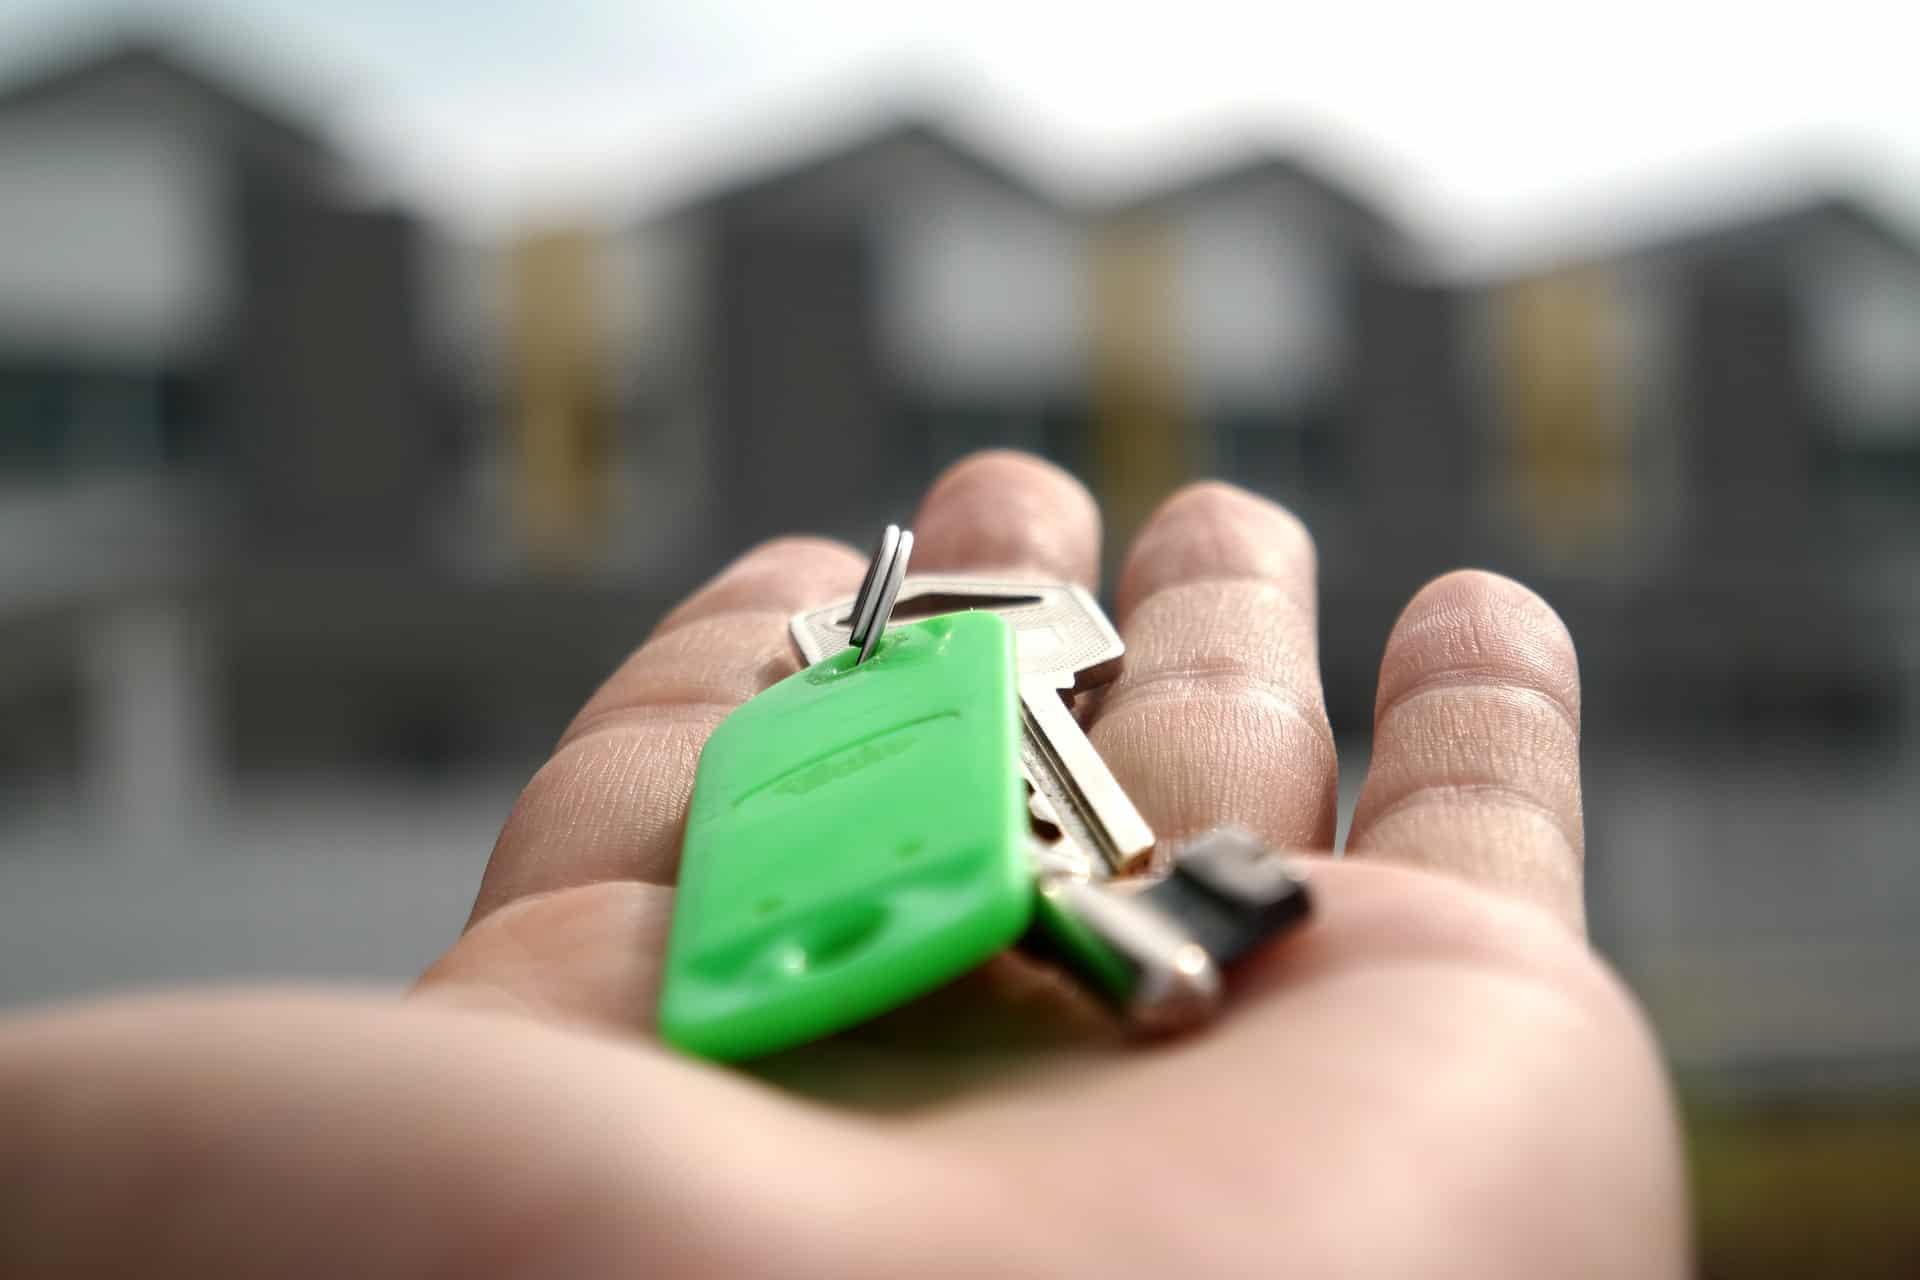 sell inherited property keys